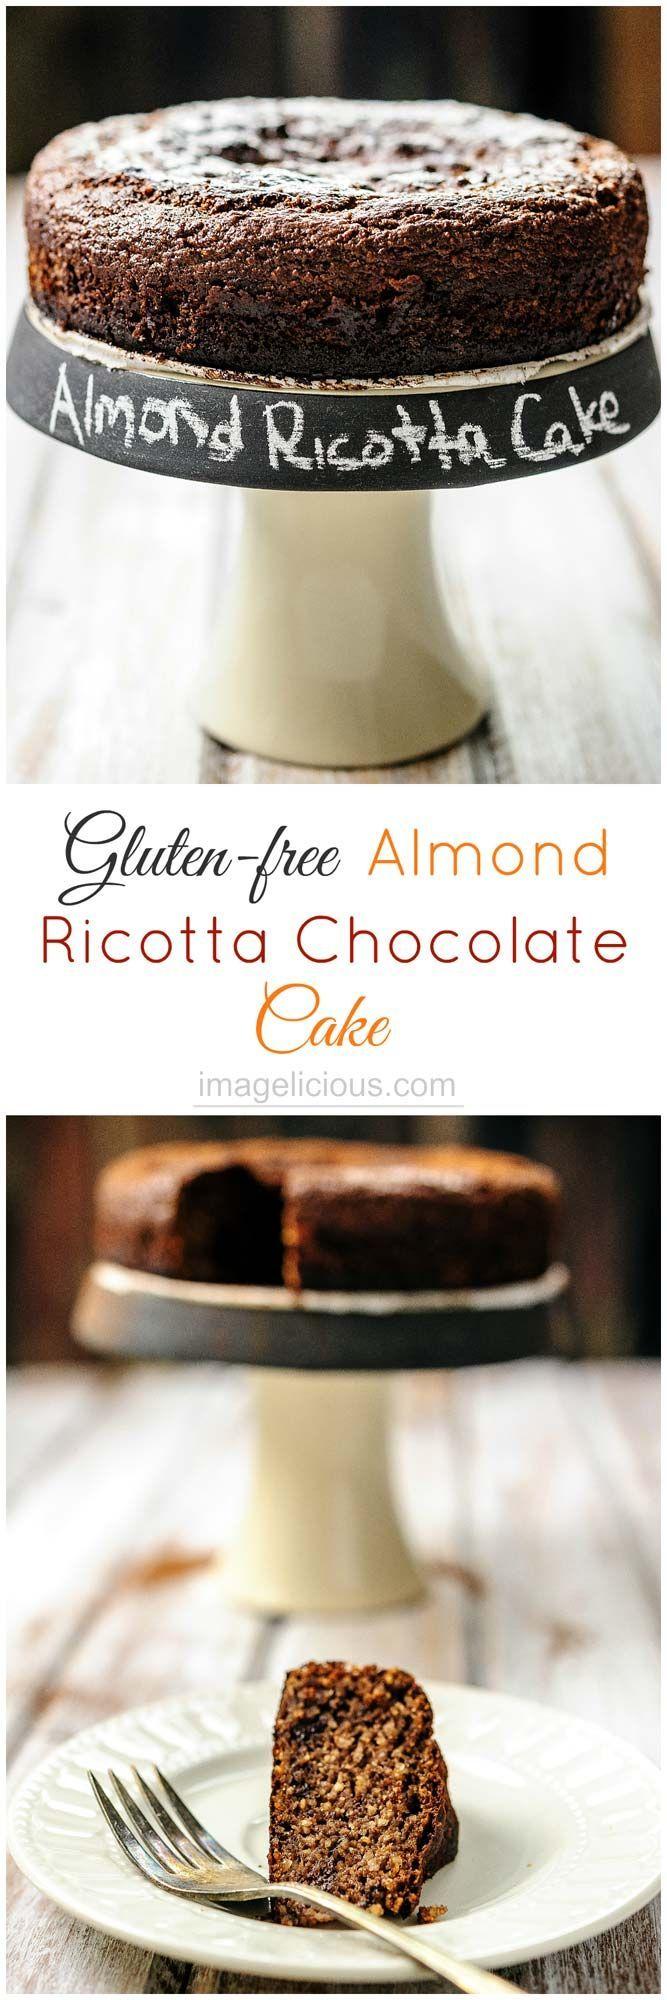 about DESSERT n CAKES on Pinterest | Chocolate mud cake, Chocolate ...